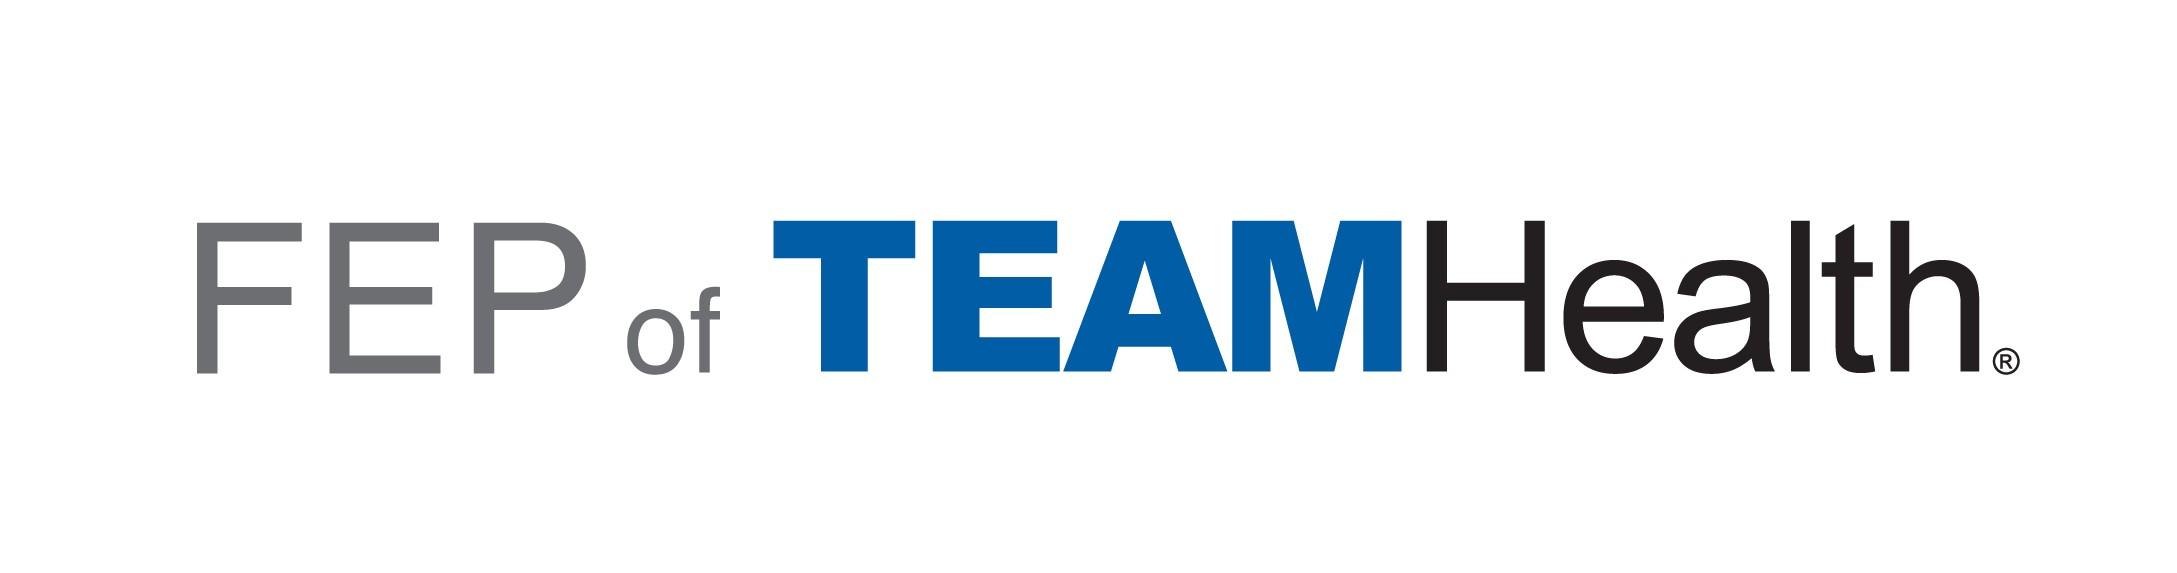 Florida Emergency Physicians of TEAMHealth | LinkedIn